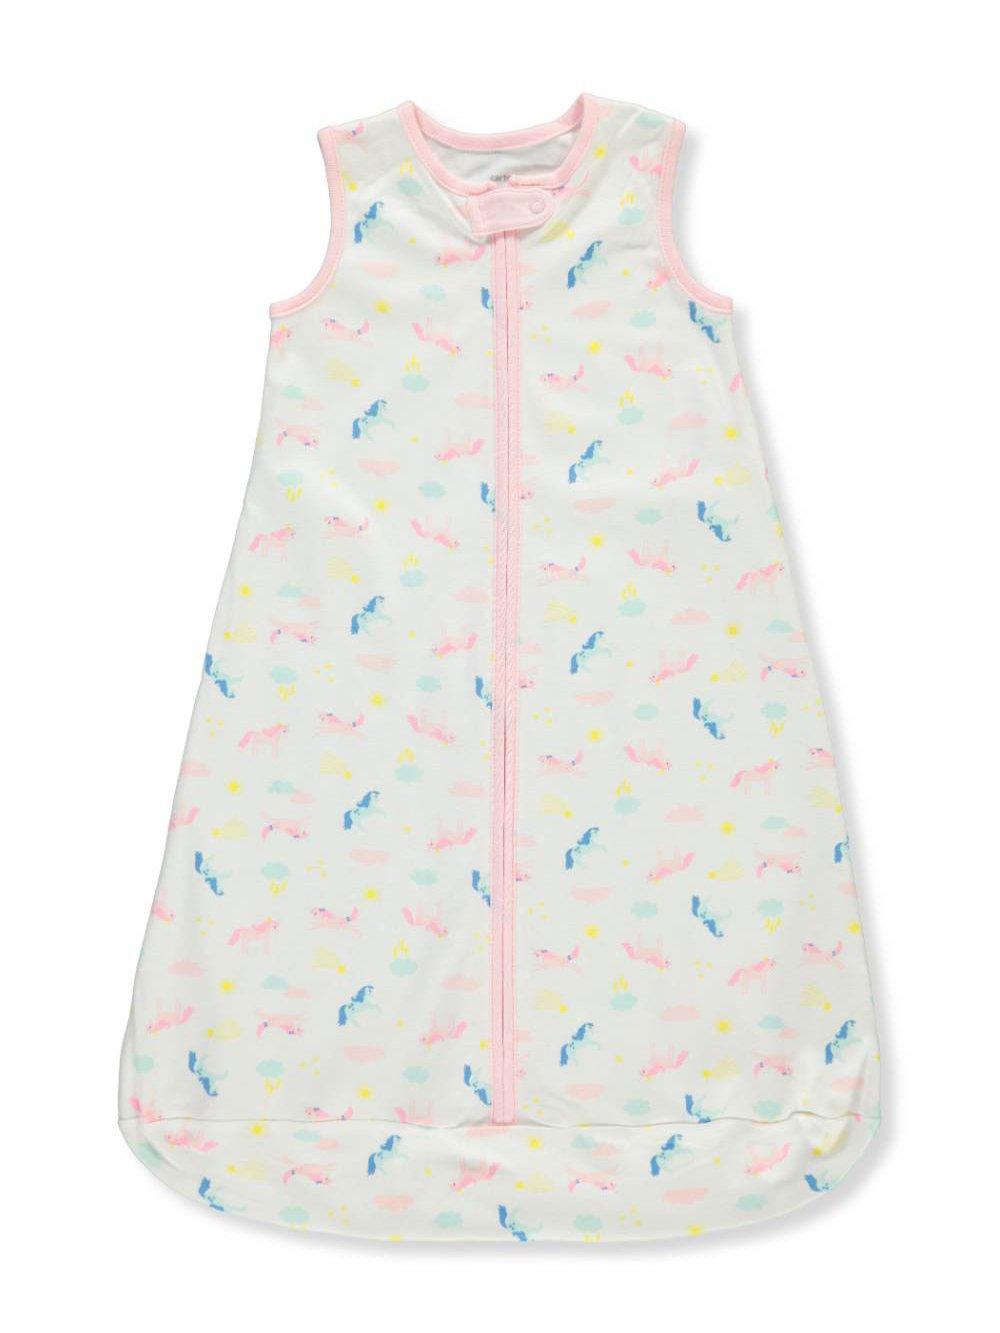 Cookie's Kids Carter's Baby Girls' Sleep Bag - White, 0-3 Months